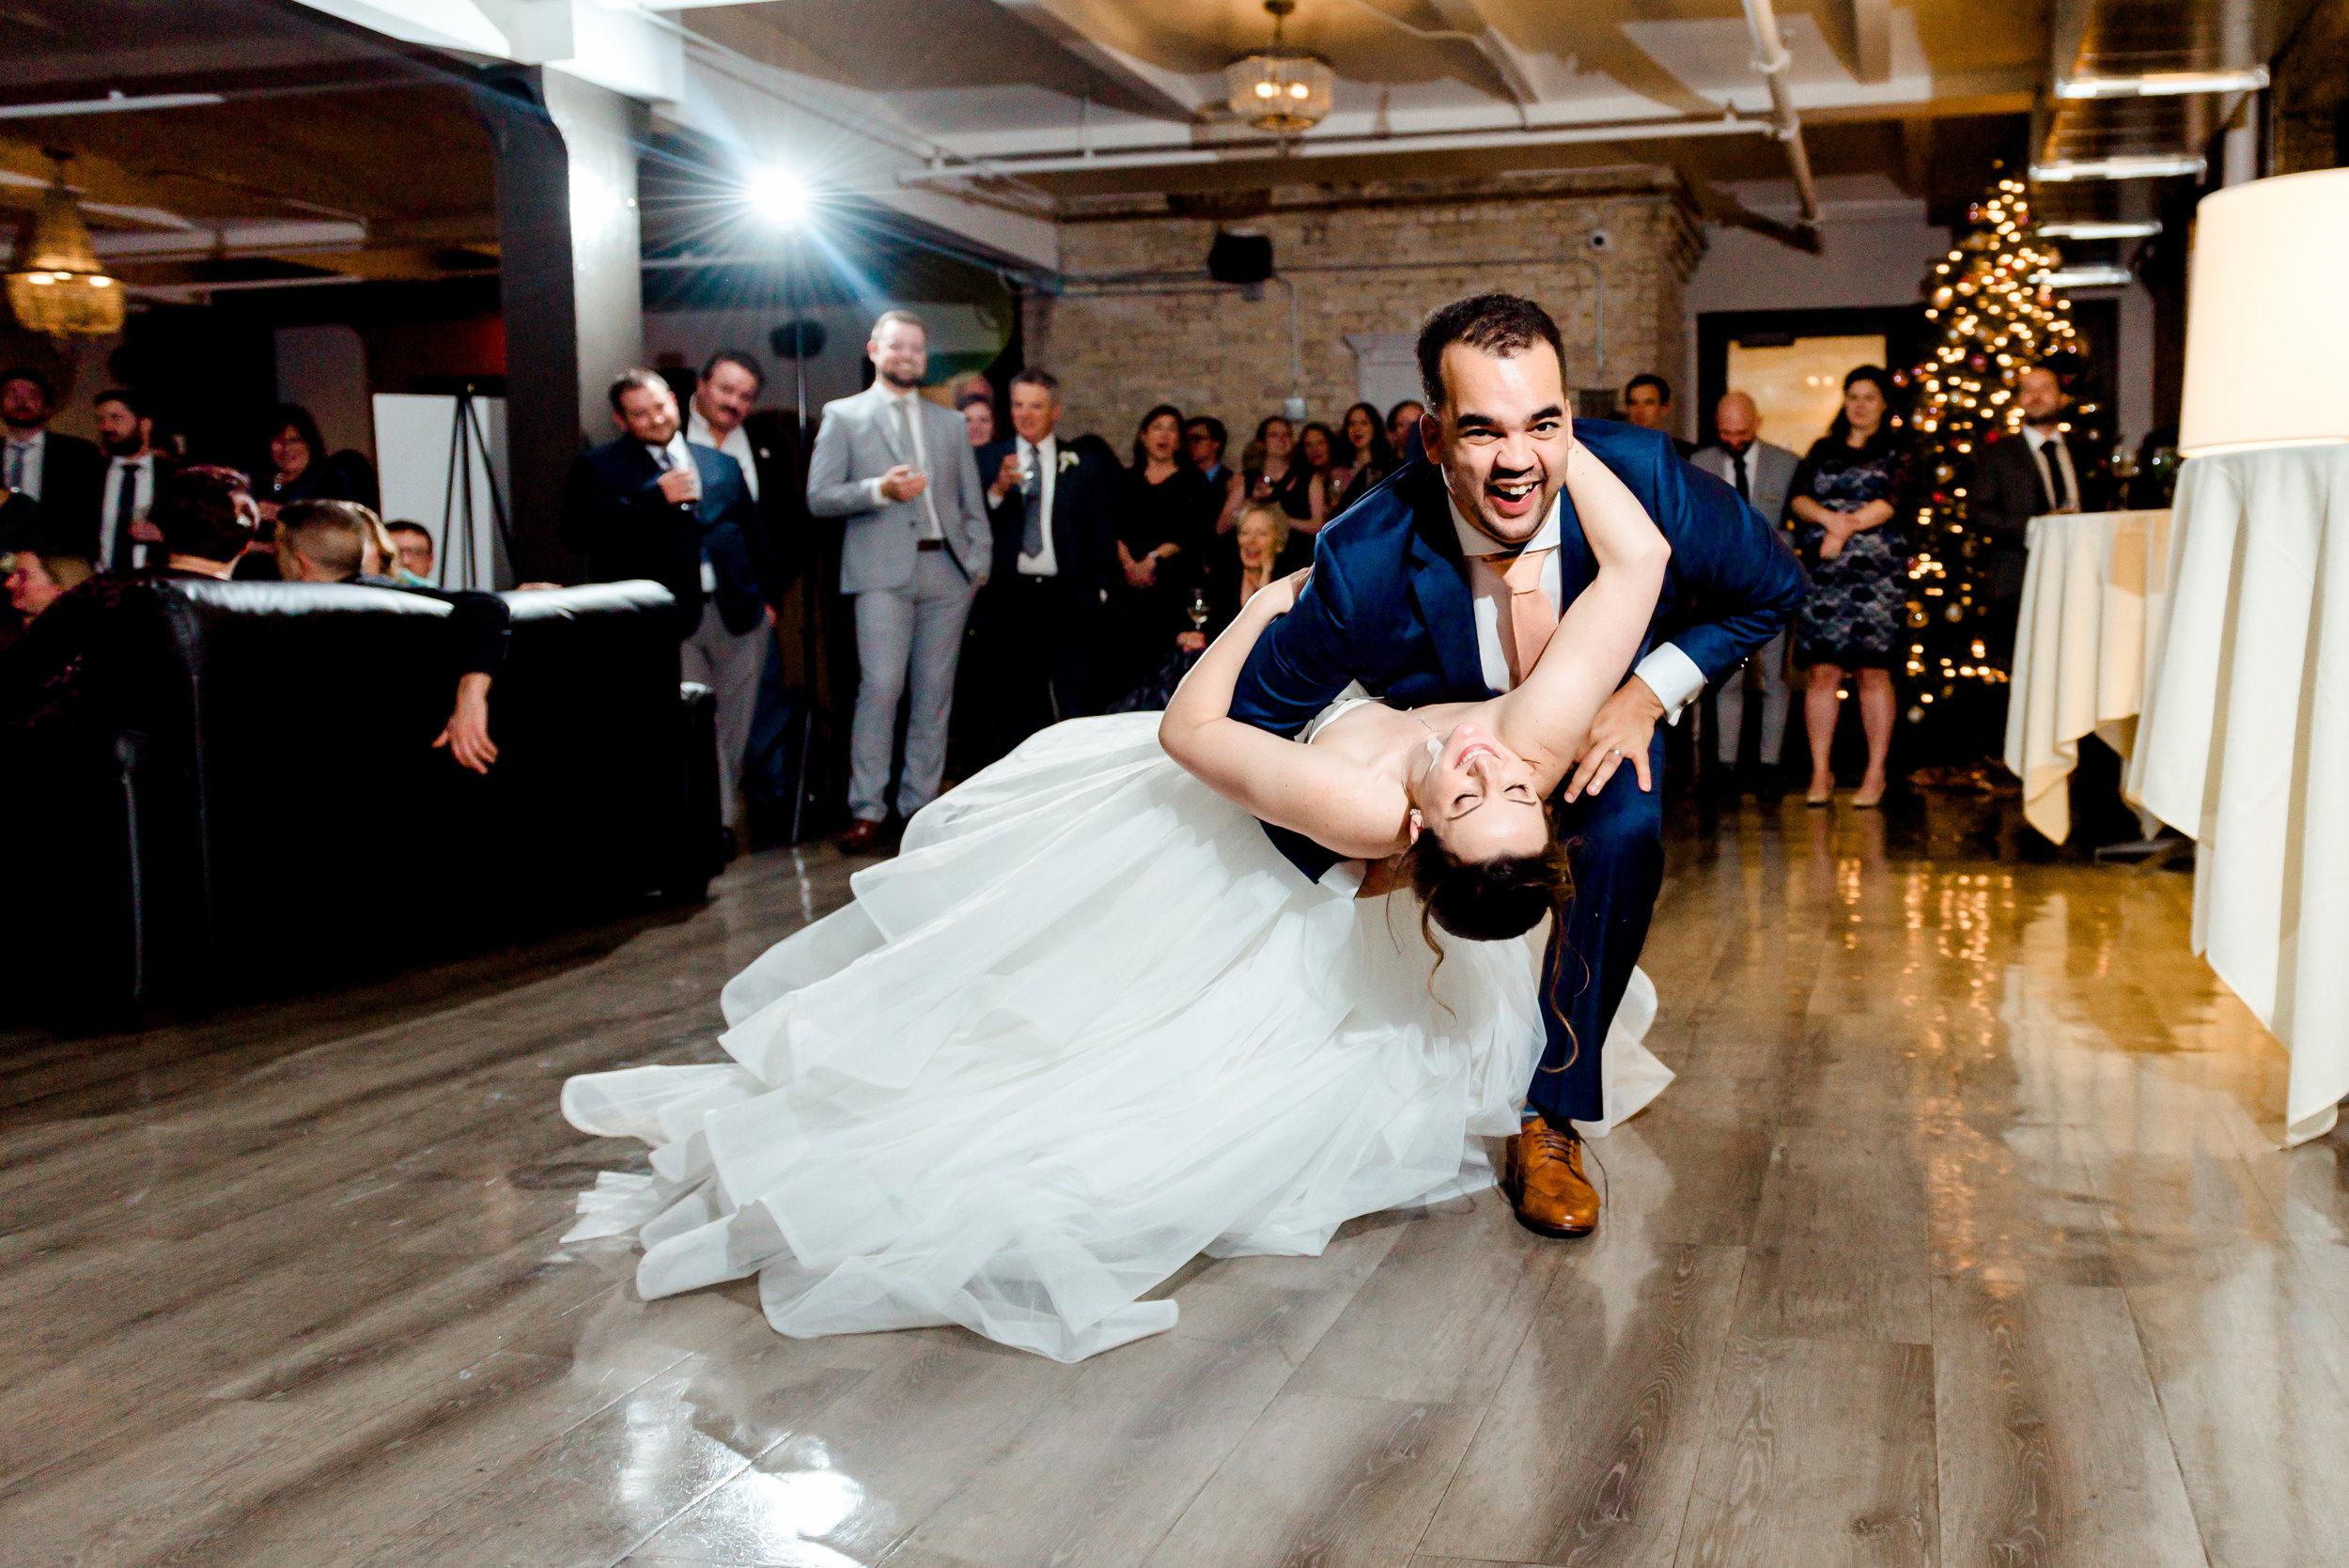 Megan and Alec - Lumber Exchange Wedding Sawyer Dylan Room - Highlights-288.jpg